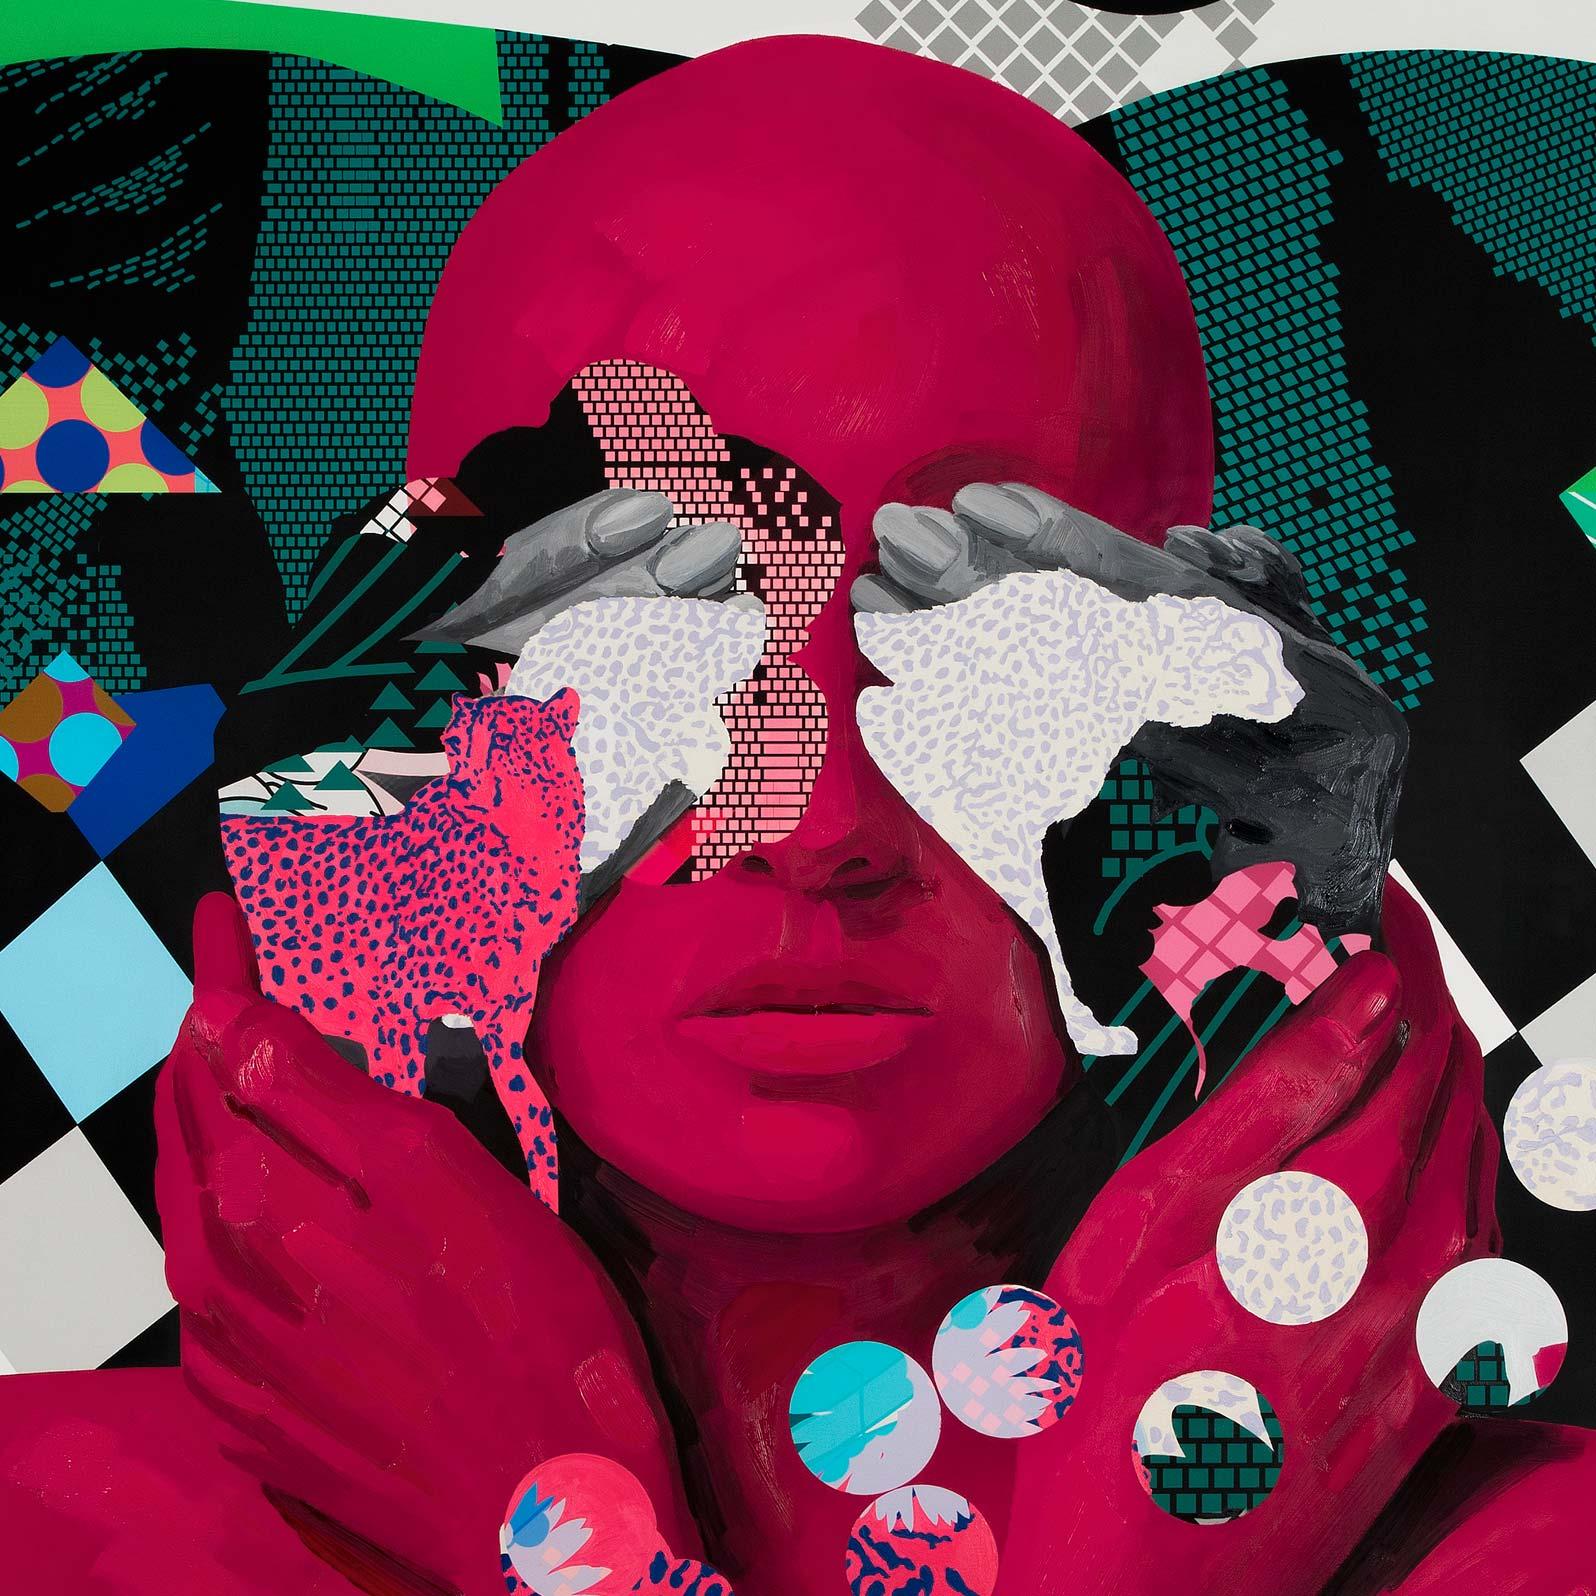 Anca Stefanescu | Contemporary Creative Painter, PatternsOfPerception